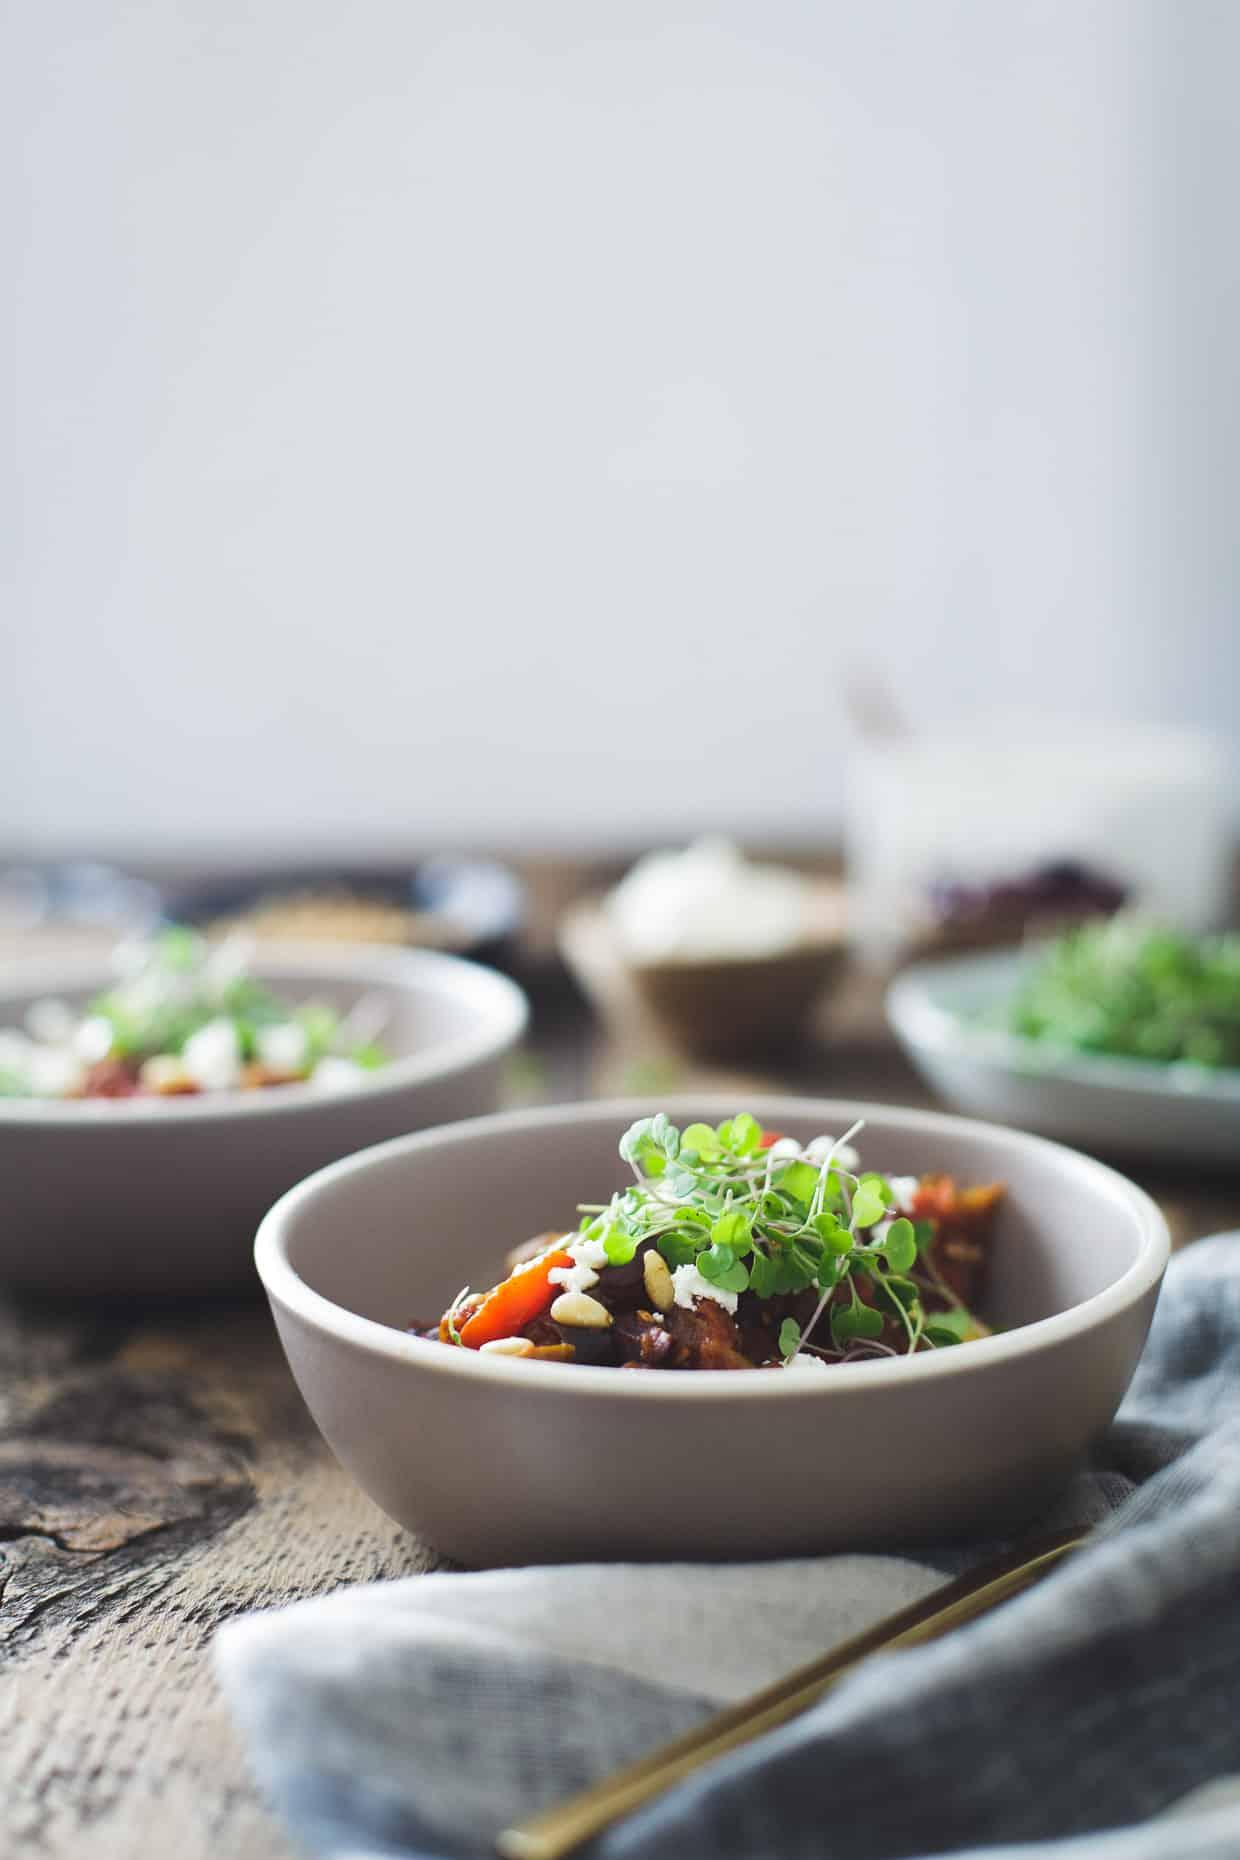 Tomato Eggplant Stew over Polenta